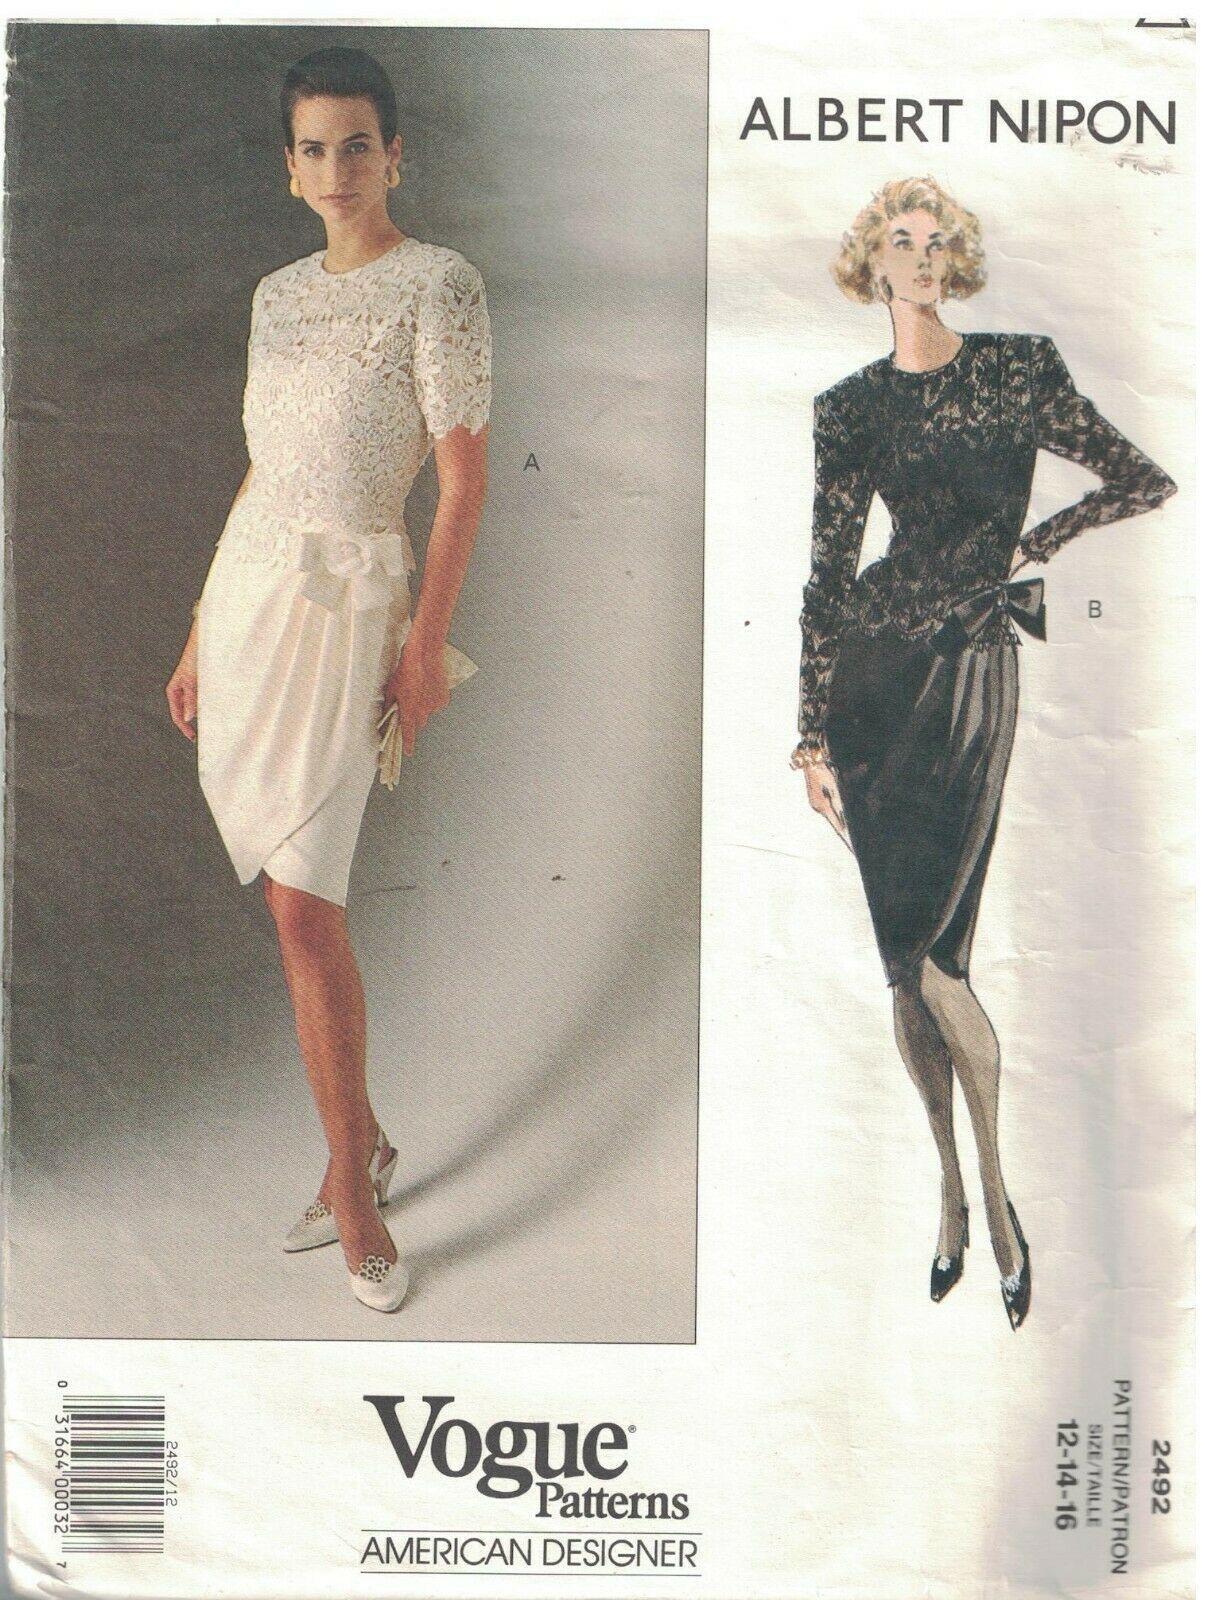 2492 Vogue Sewing Pattern Misses Lined Dress Top Albert Nipon American Designer